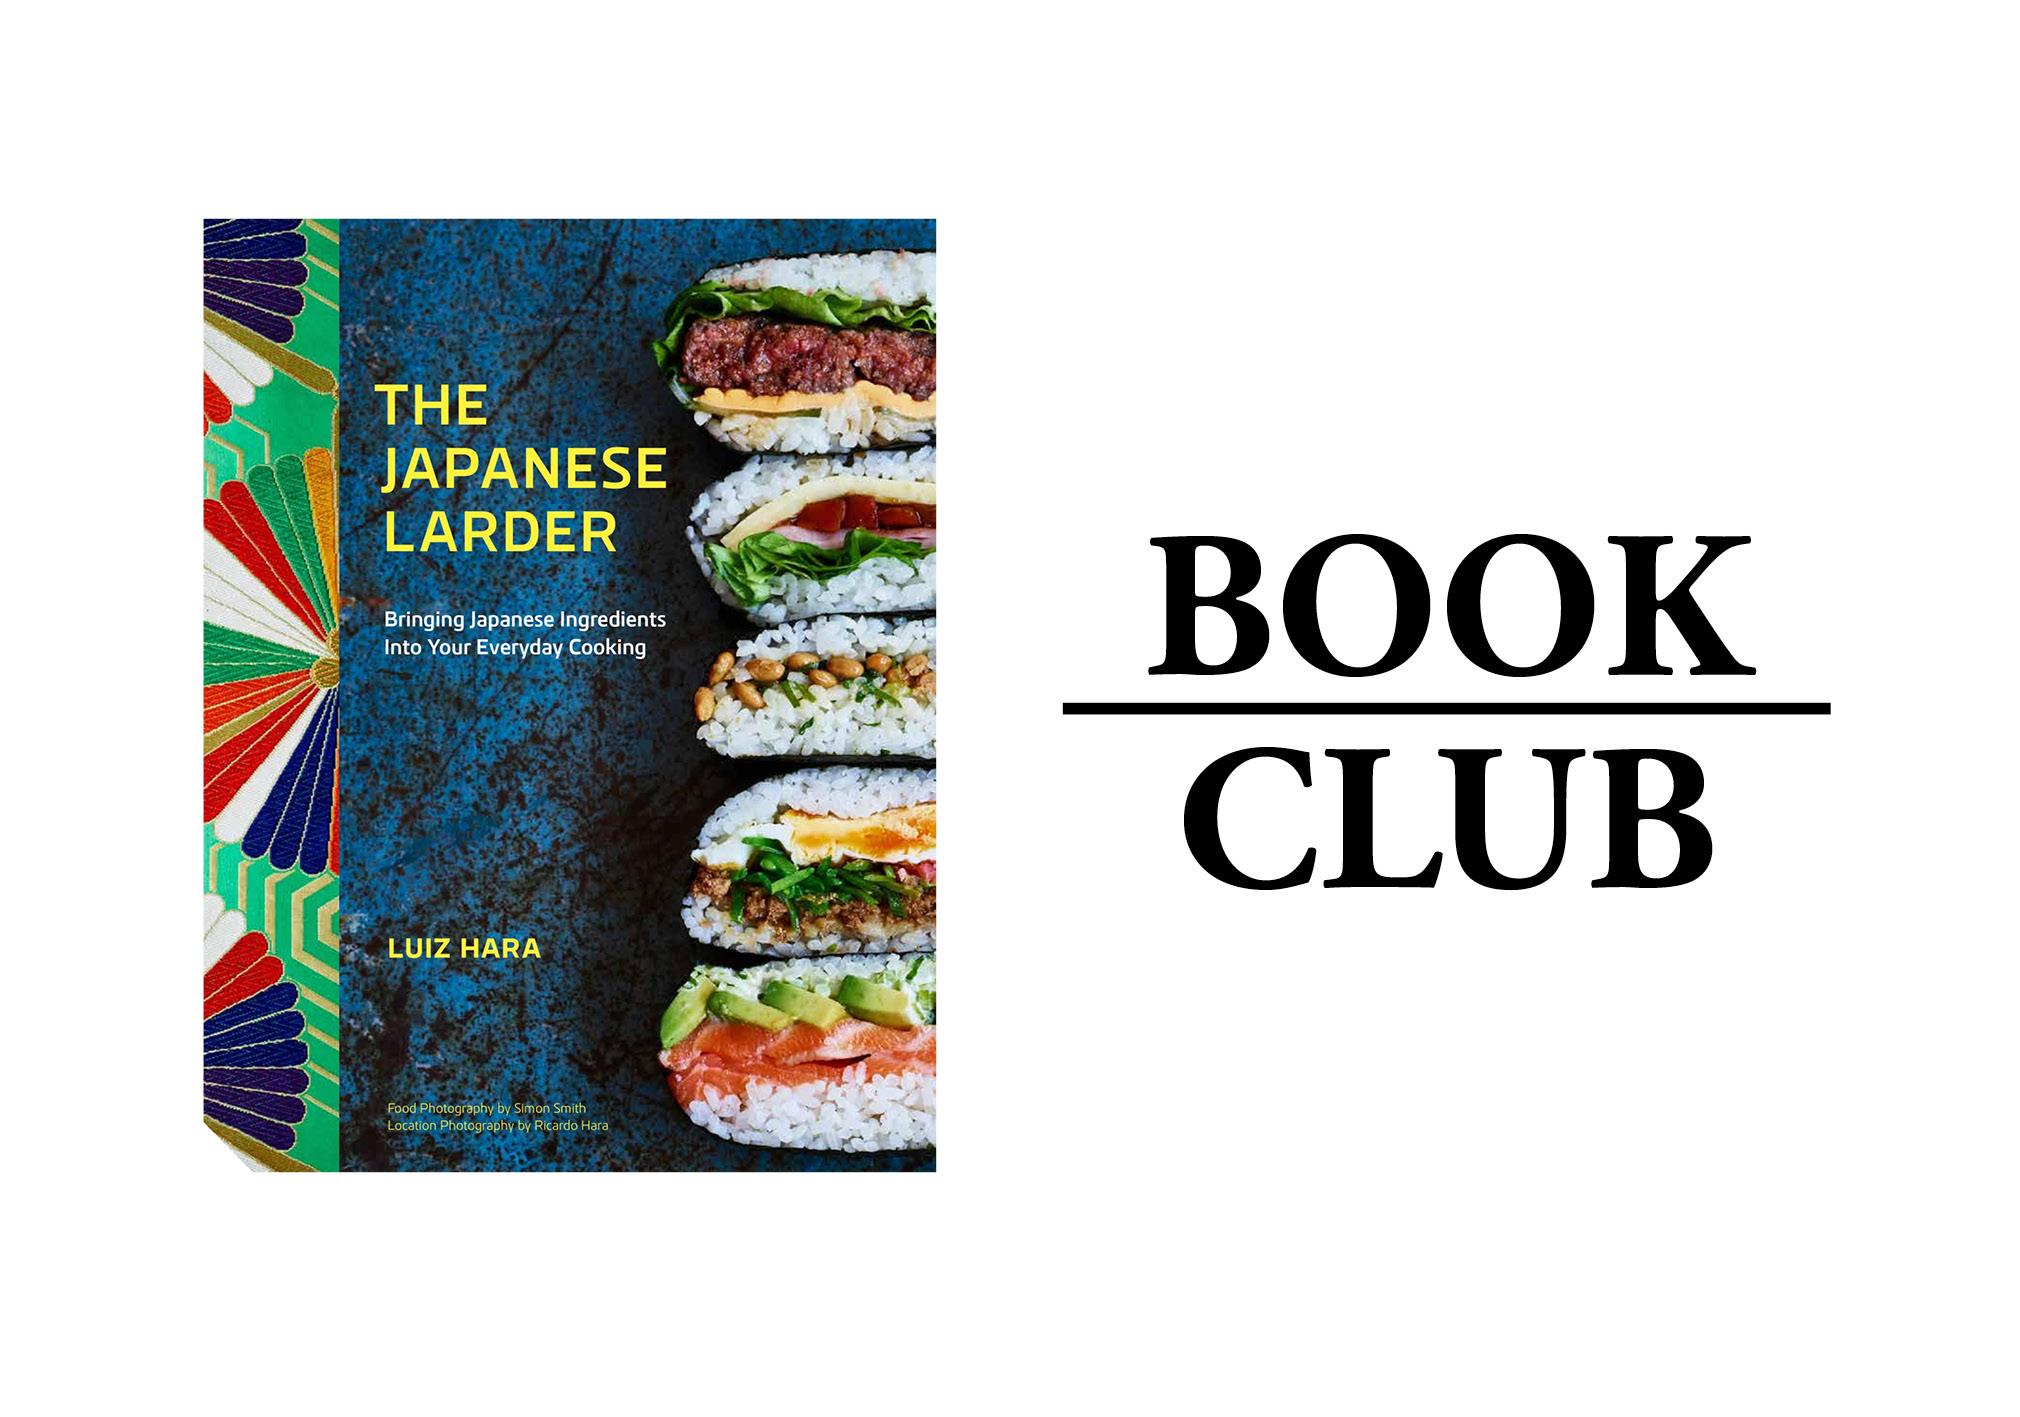 THE JAPANESE LARDER By Luiz Hara